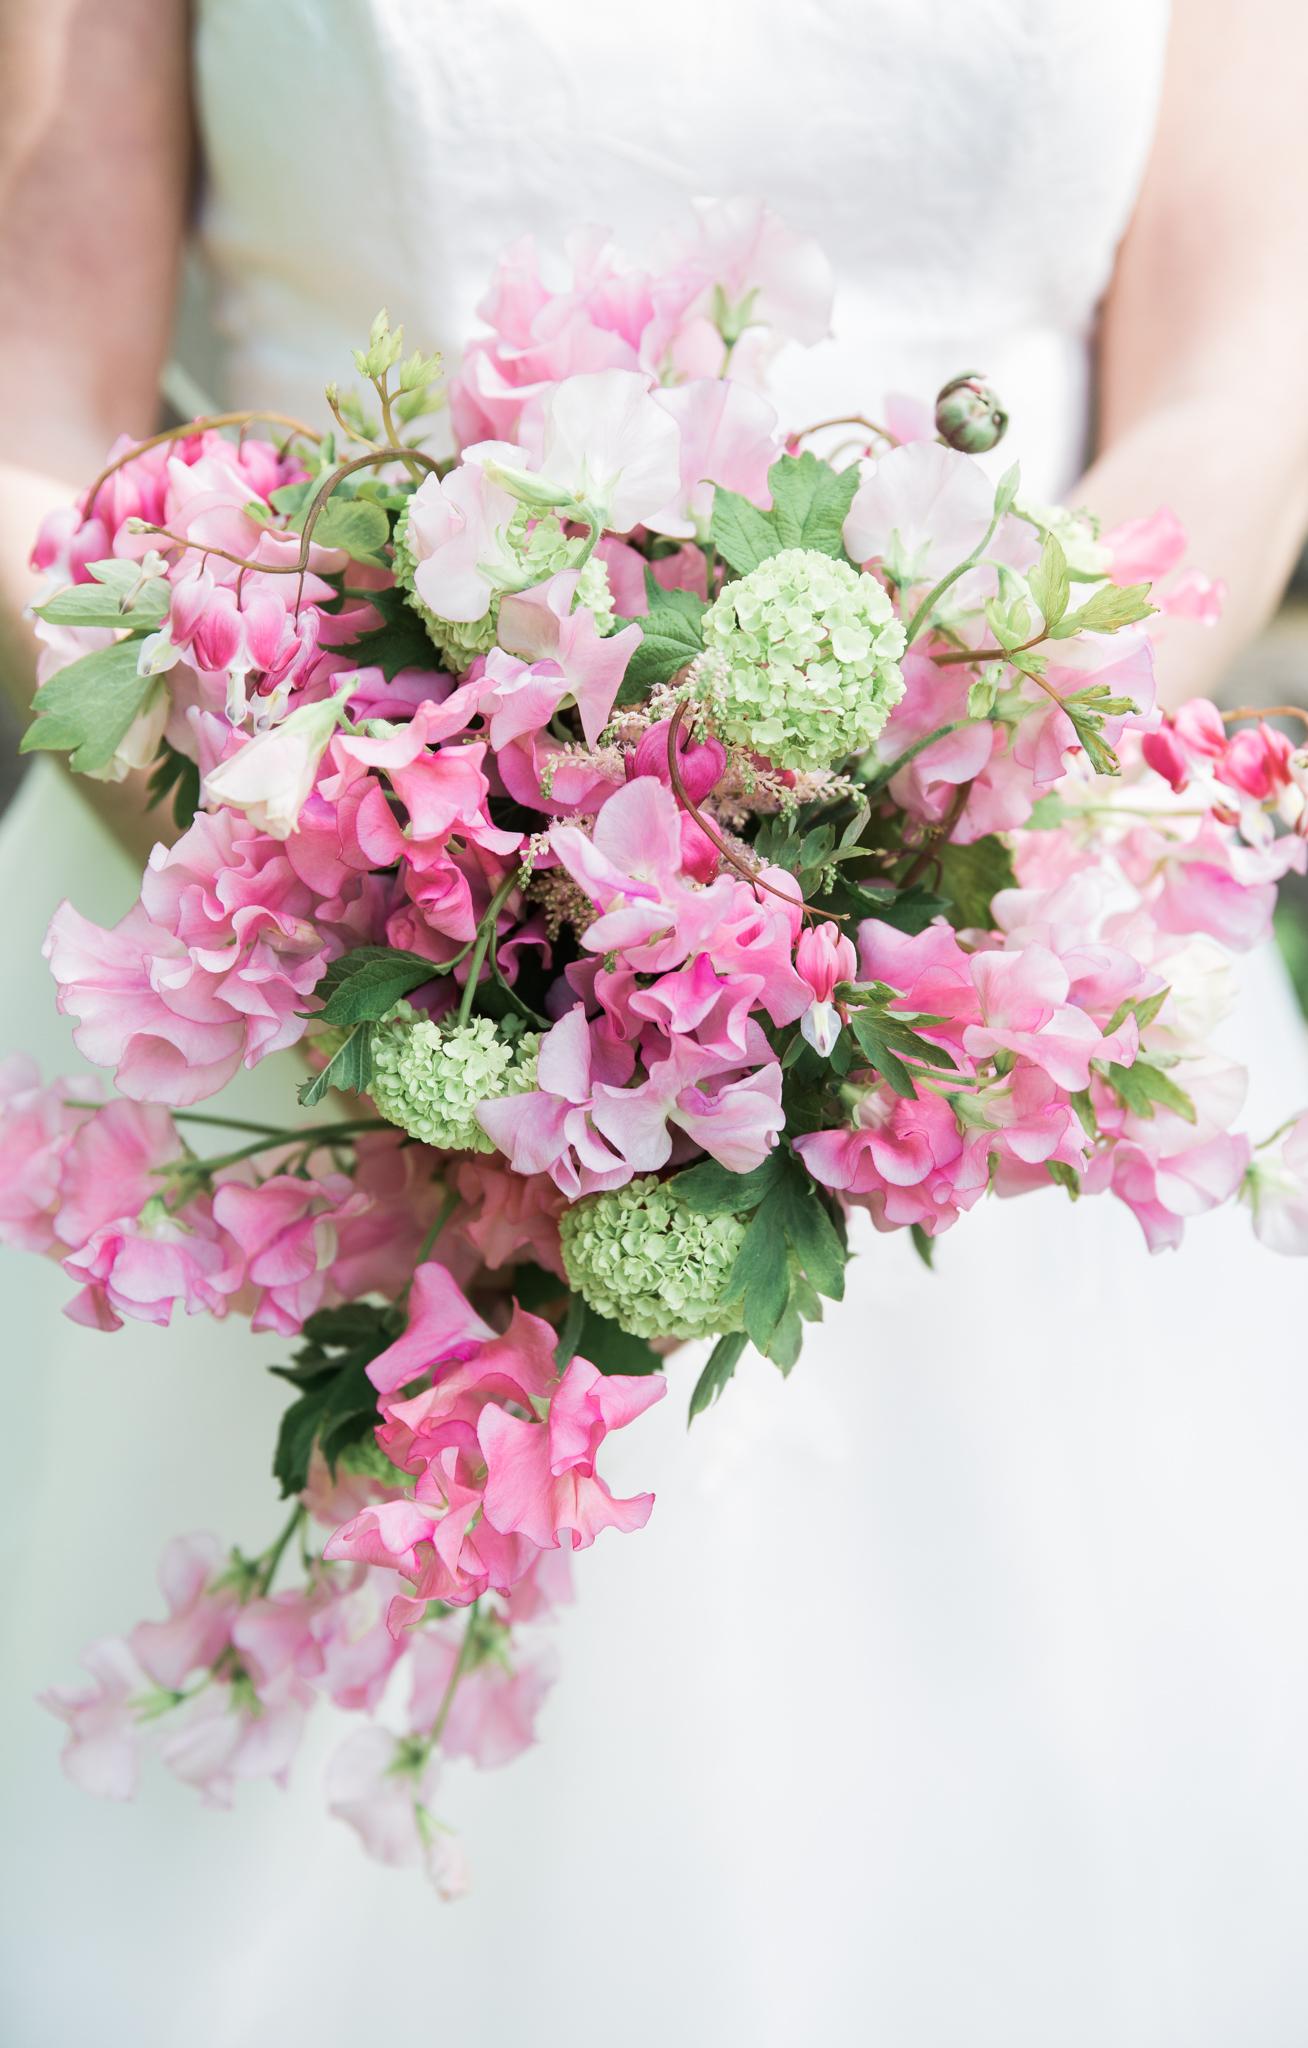 ViOli Photography bröllopsfotograf-Karlshamn-Blekinge-Ronneby-Karlskrona-Sölvesborg-Bromölla-Kristianstad (15 av 35)